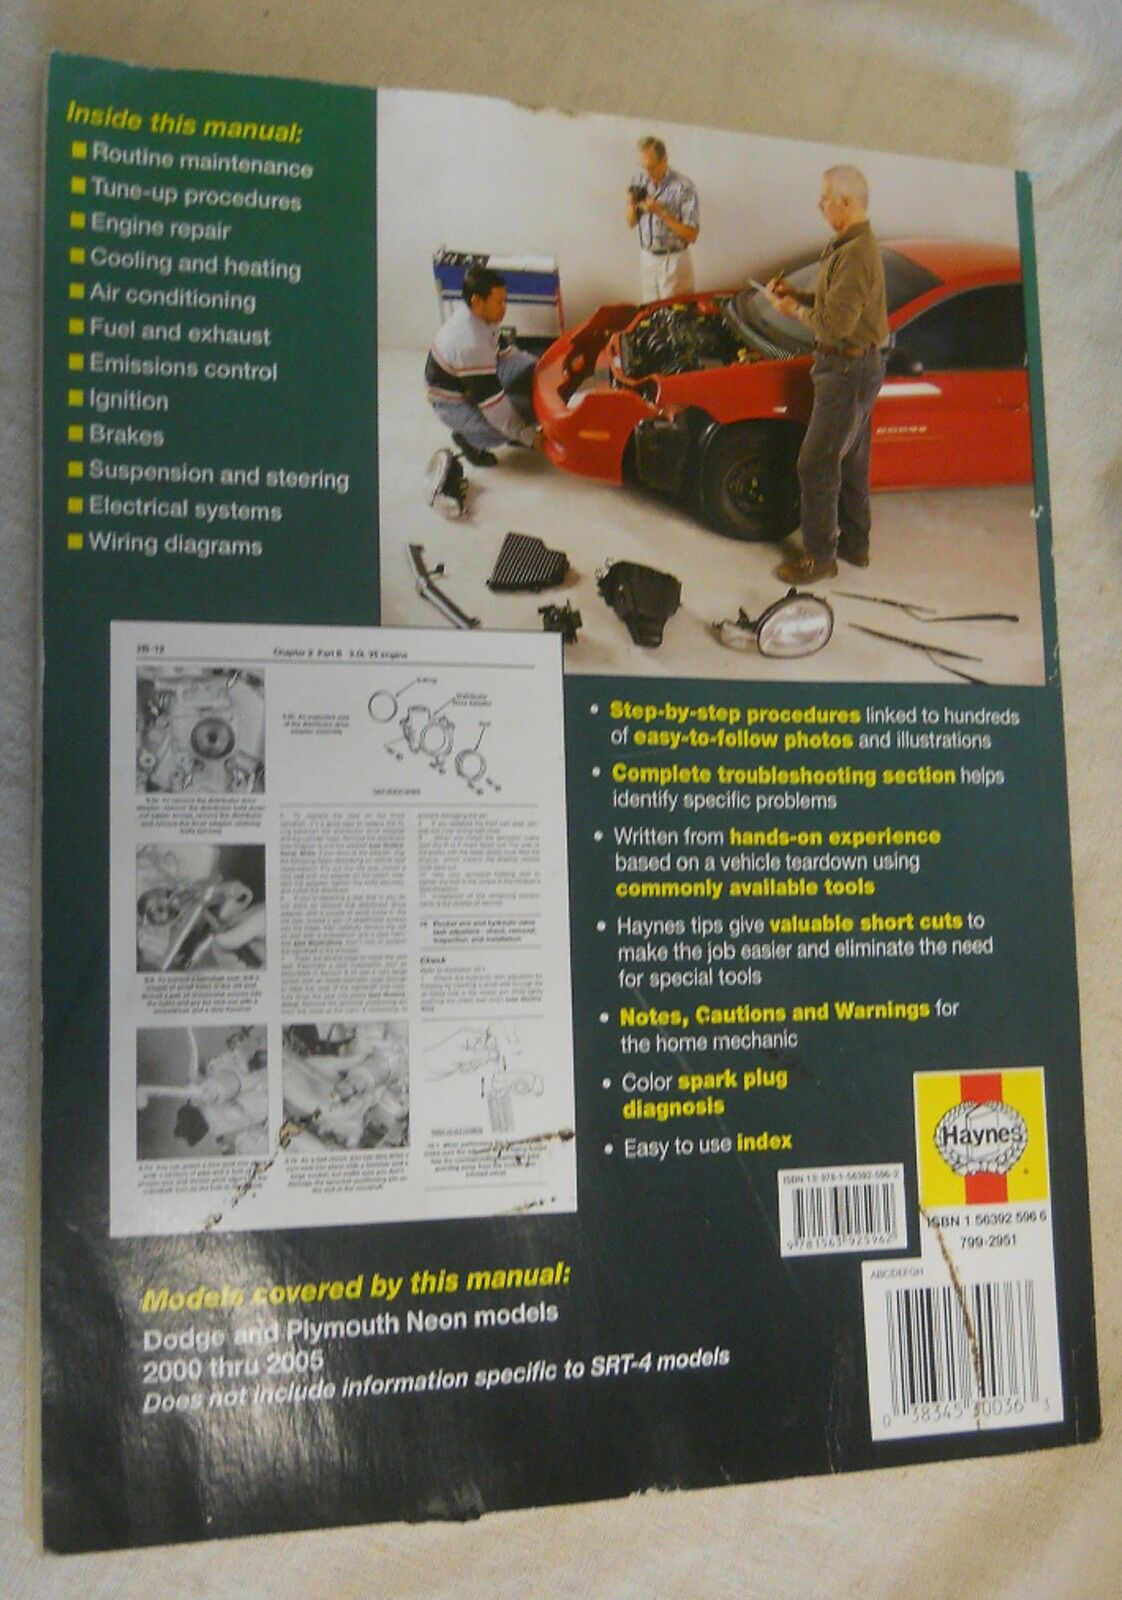 Dodge Plymouth Neon 2000 Thru 2005 Haynes Repair Manual 30036 Ebay Engine Cooling Diagram